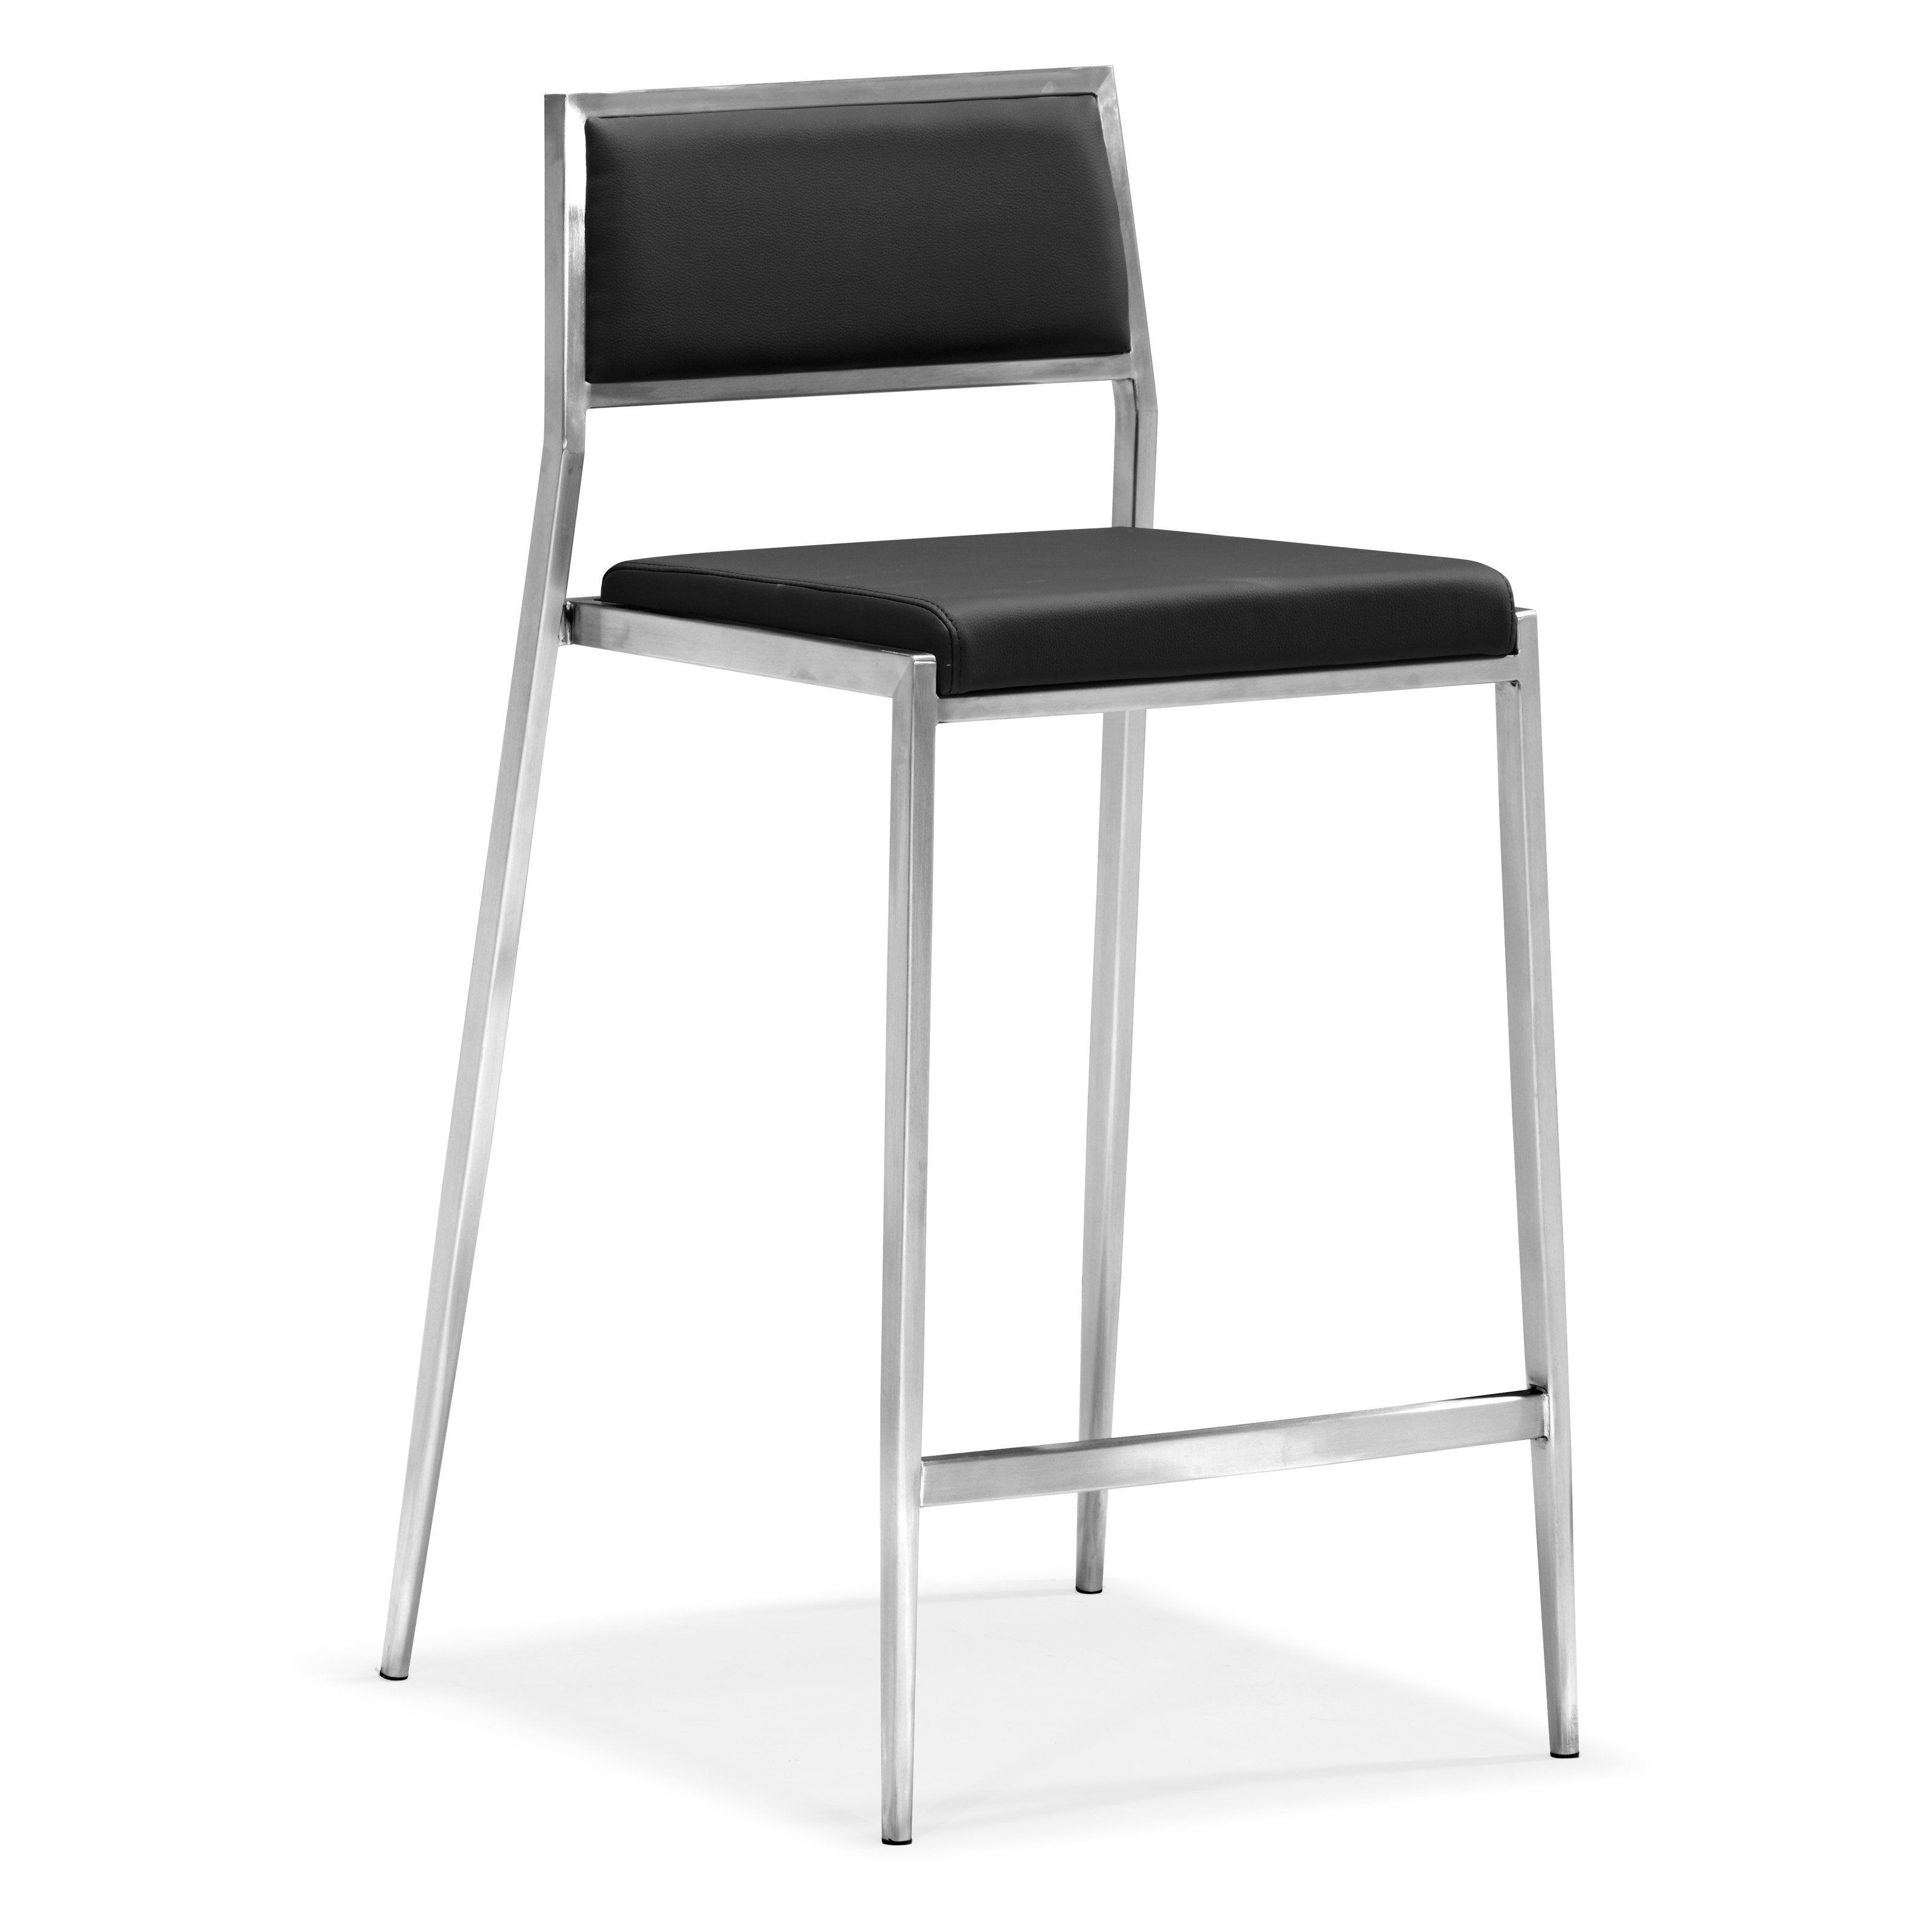 Admirable Zuo Modern Dolemite Counter Stool Set Of 2 White Kitchen Creativecarmelina Interior Chair Design Creativecarmelinacom